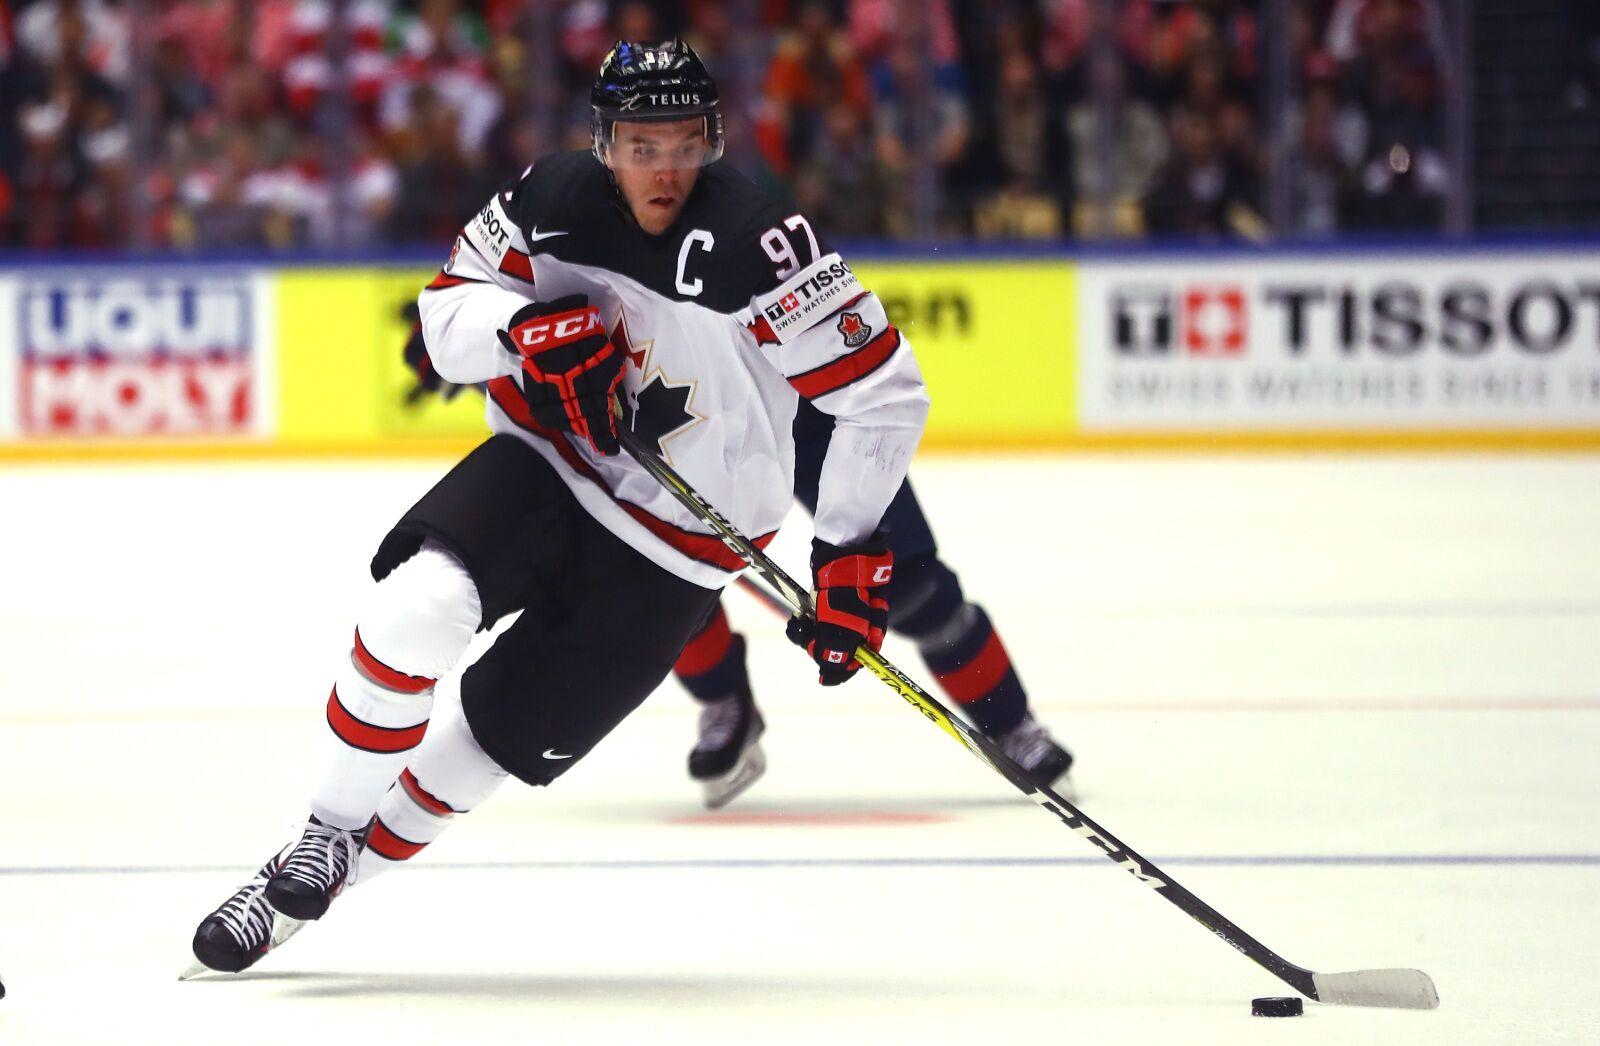 ab82dc35a24 Connor McDavid Leads Team Canada To Win Over Korea